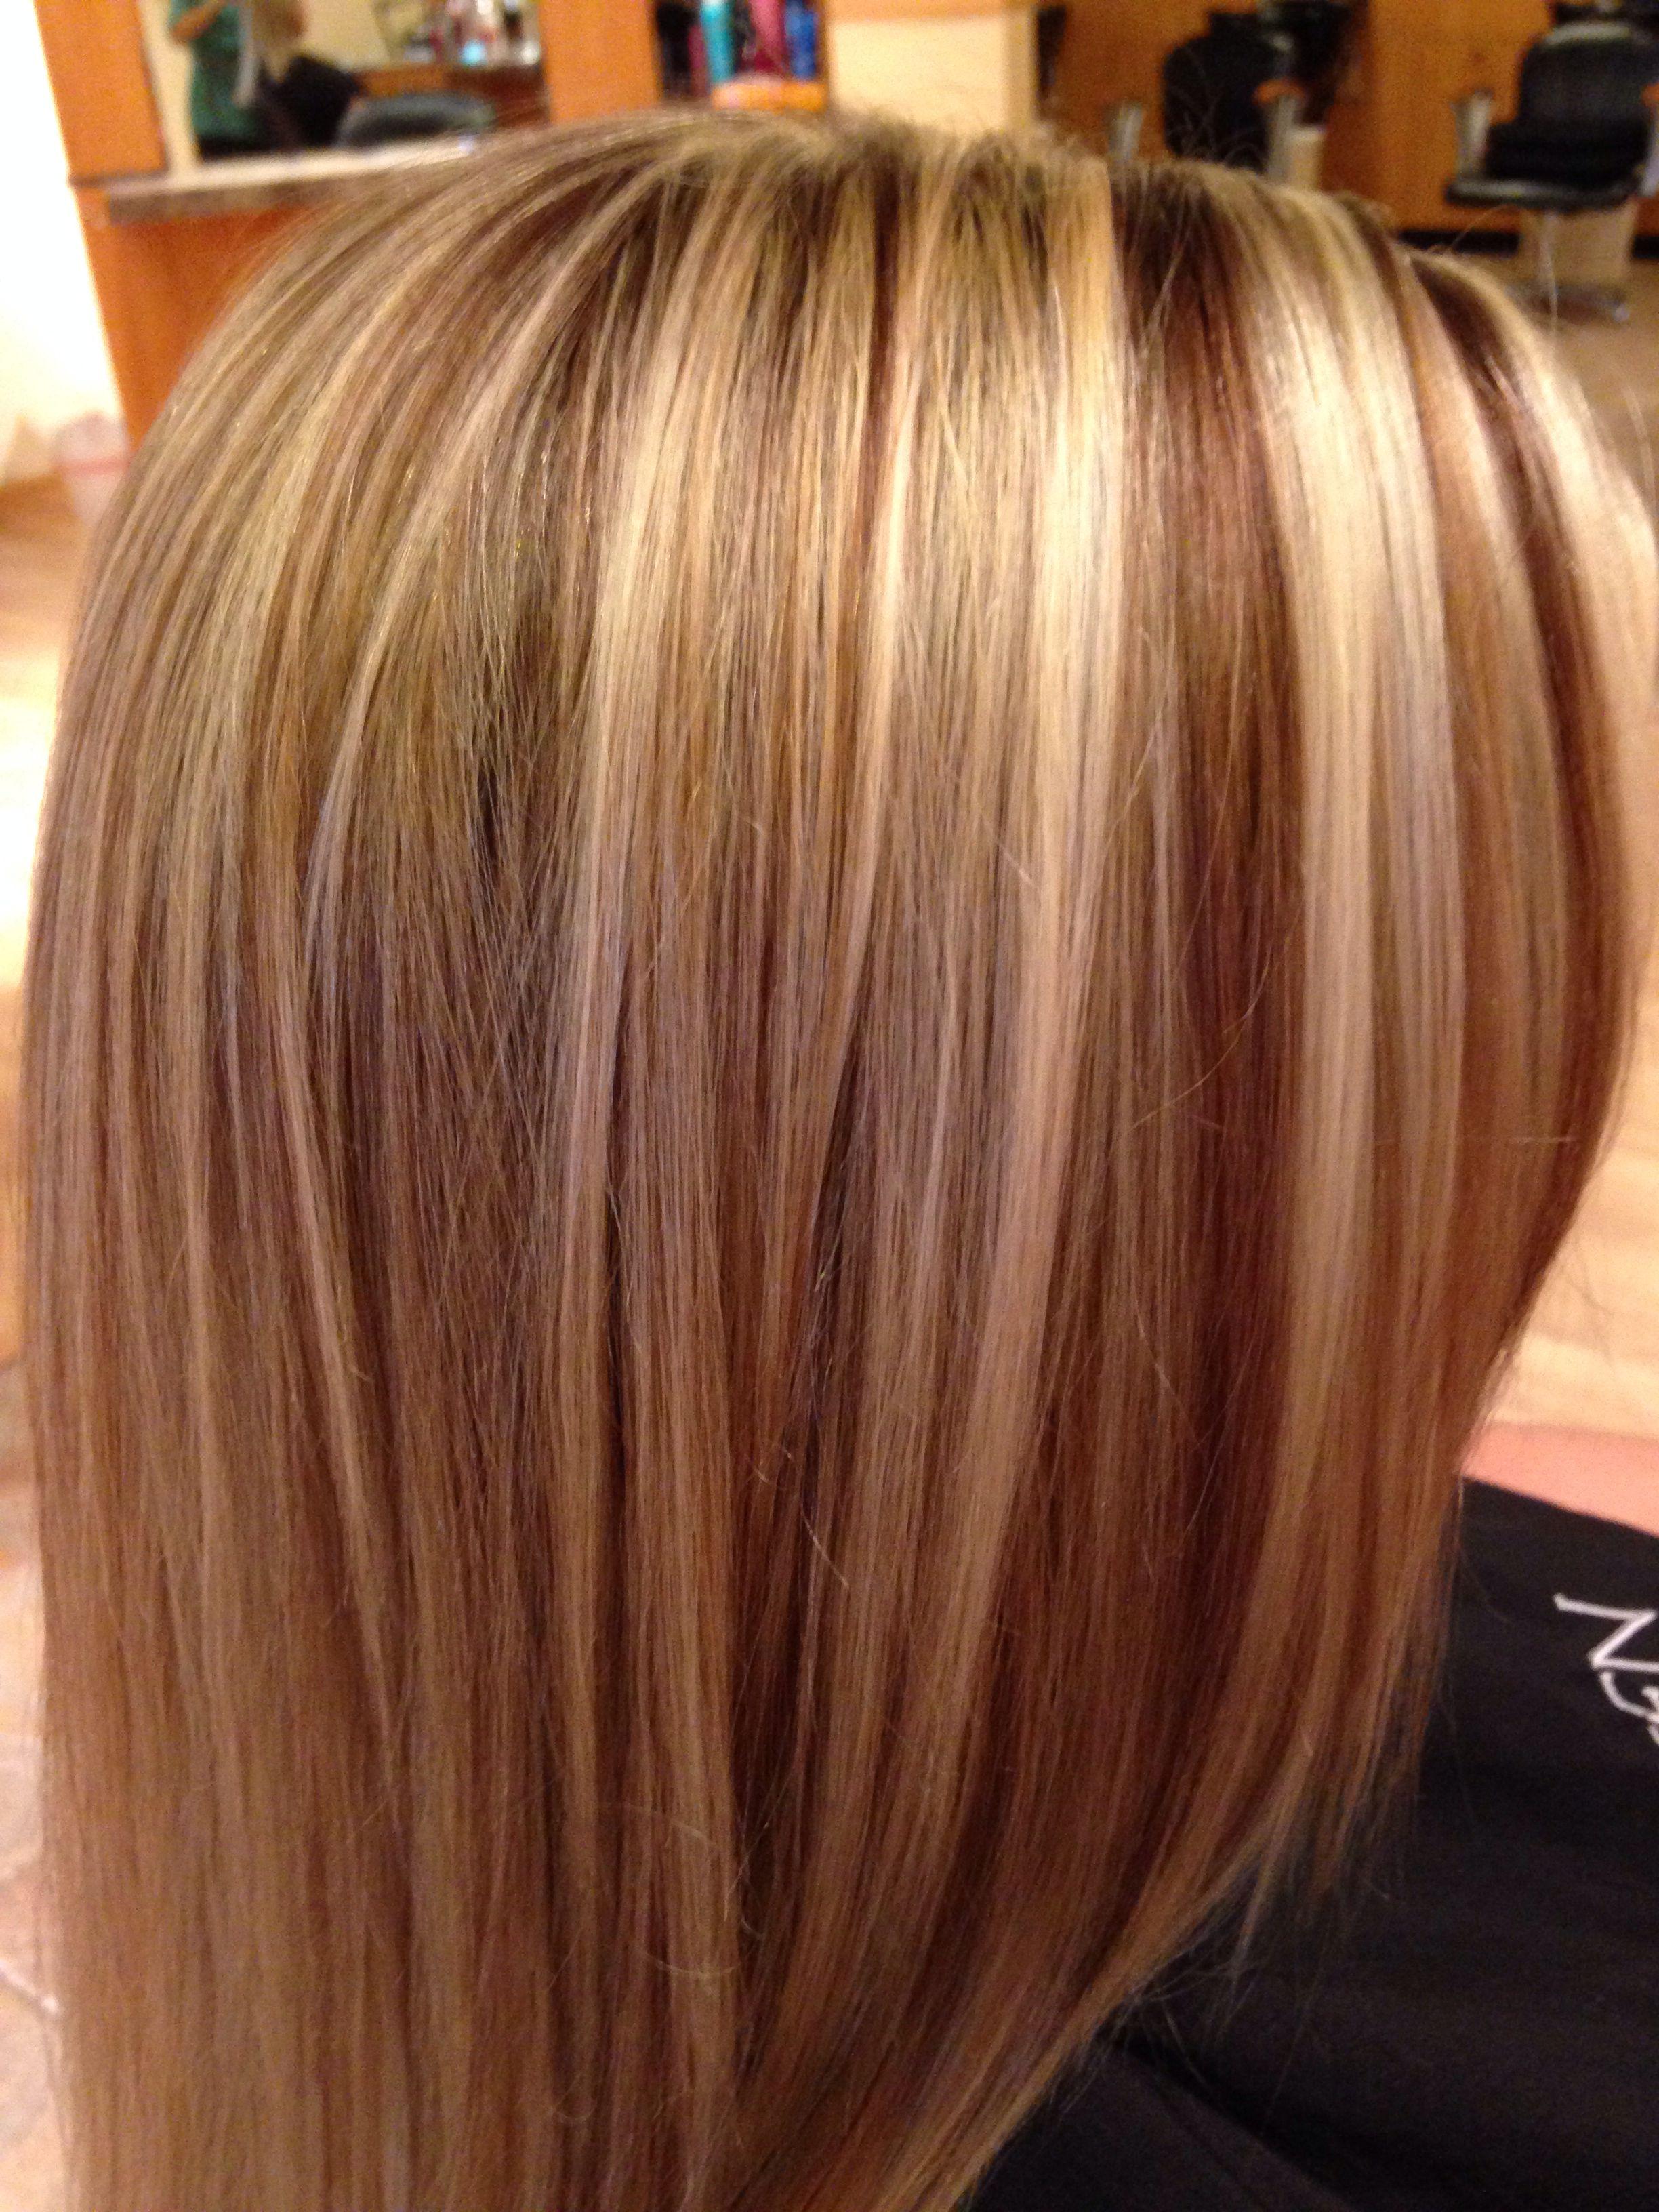 Blonde And Carmel Foils Done 10 31 13 Michelle Theilmann Beauty